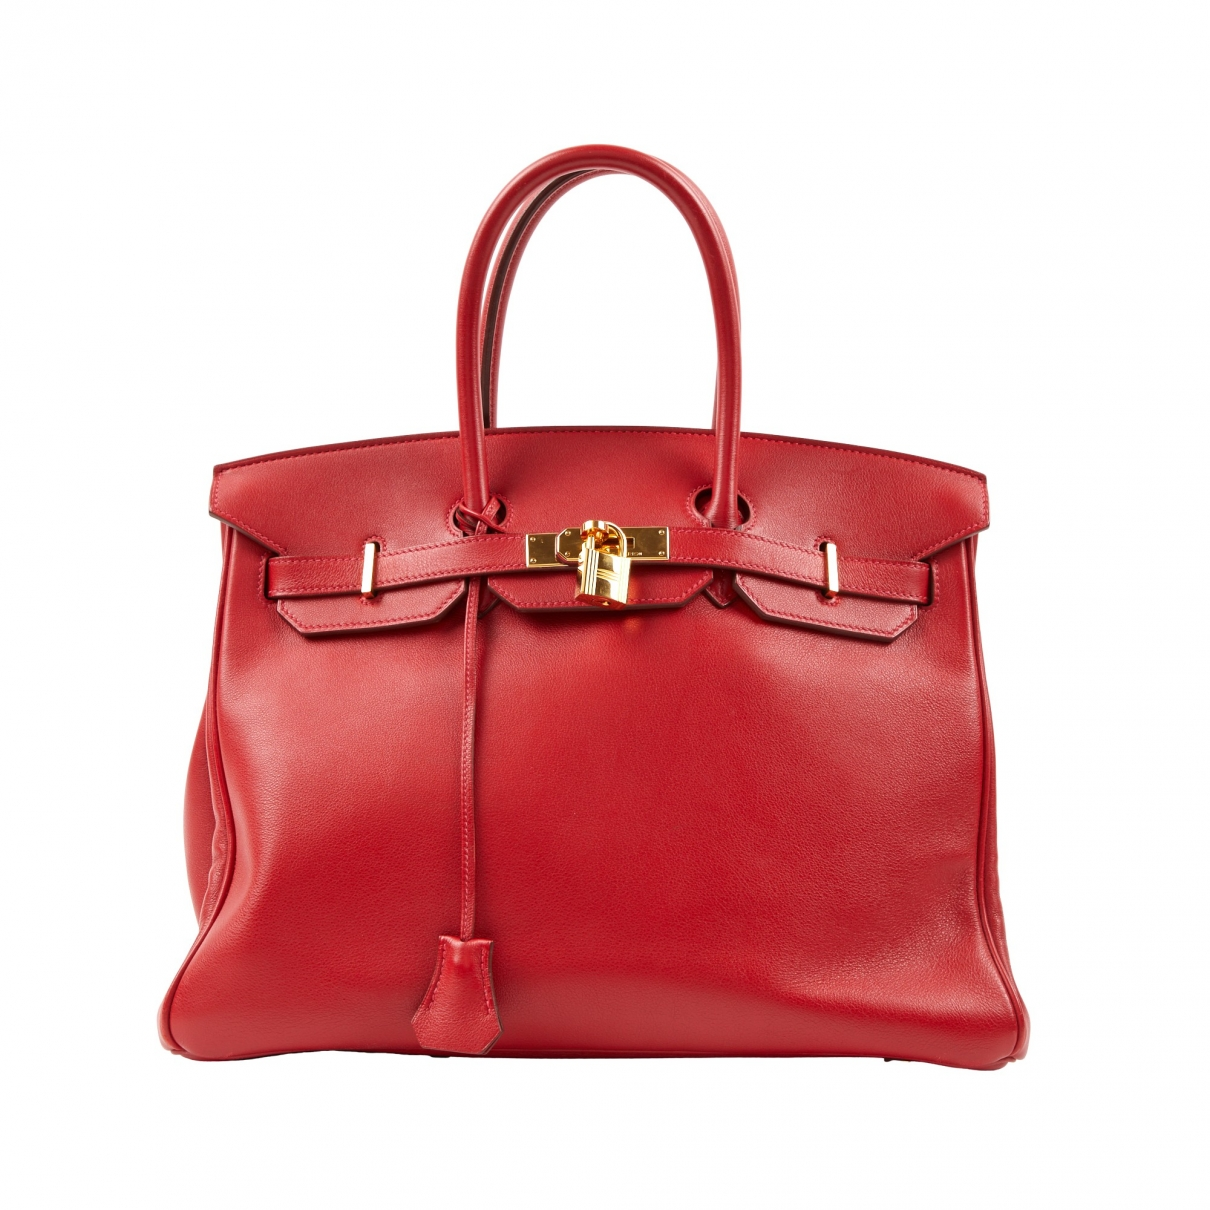 Hermes - Sac a main Birkin 35 pour femme en cuir - rouge